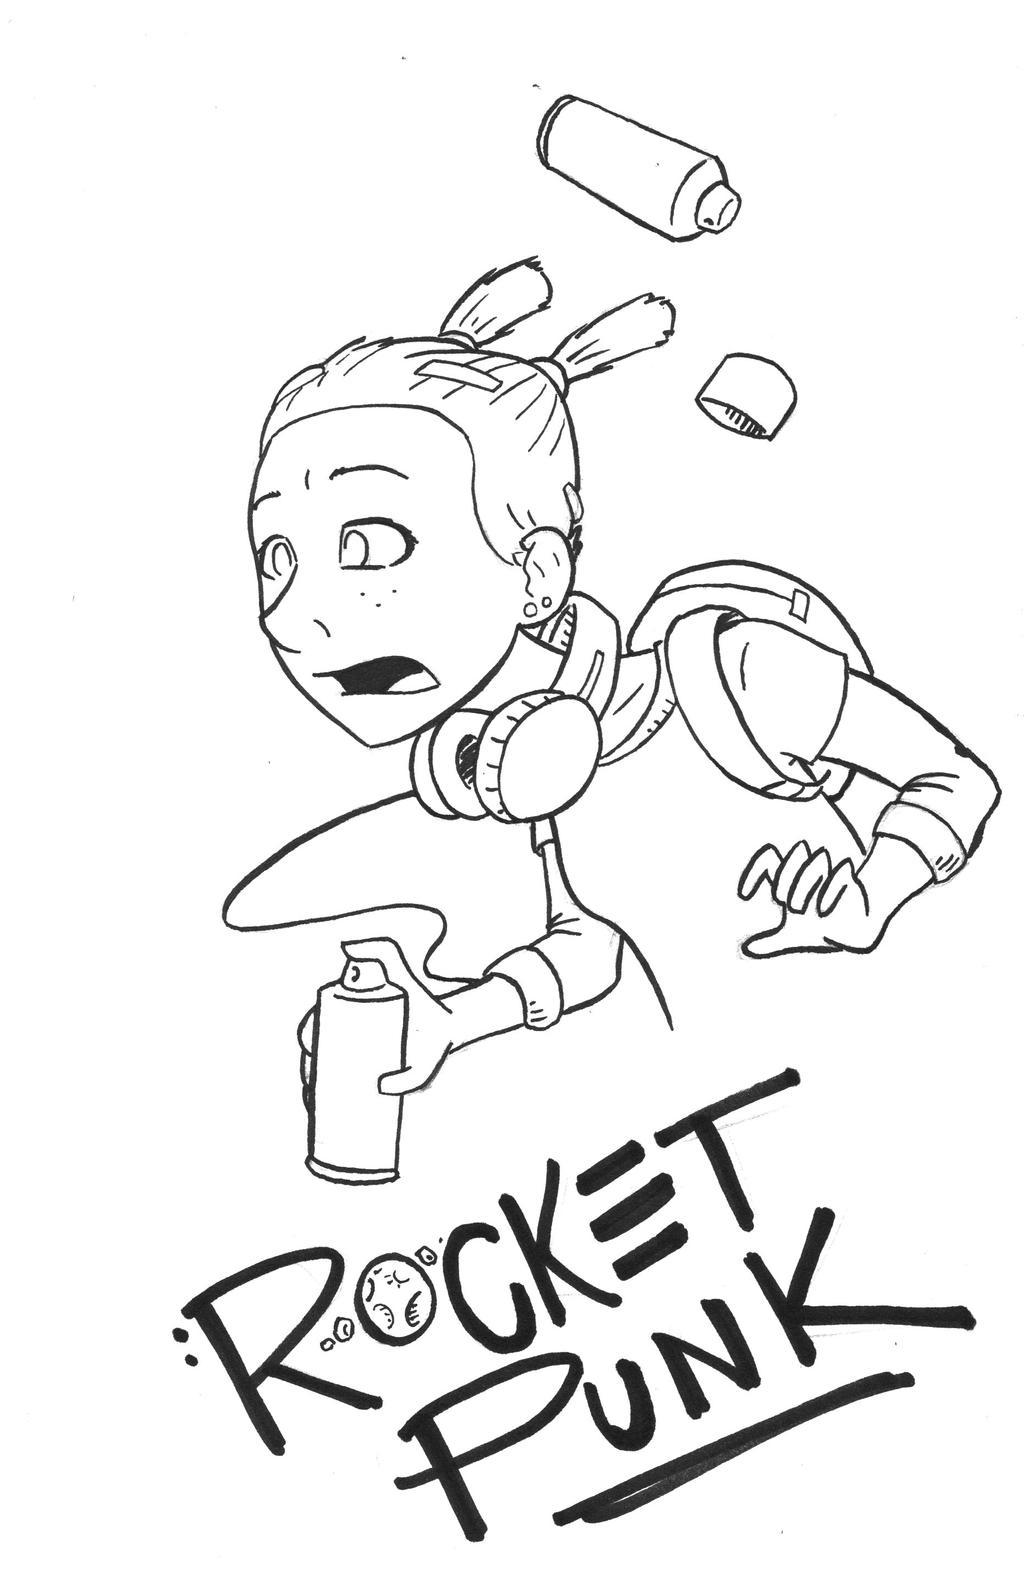 Rocket Punk by CarbonComic